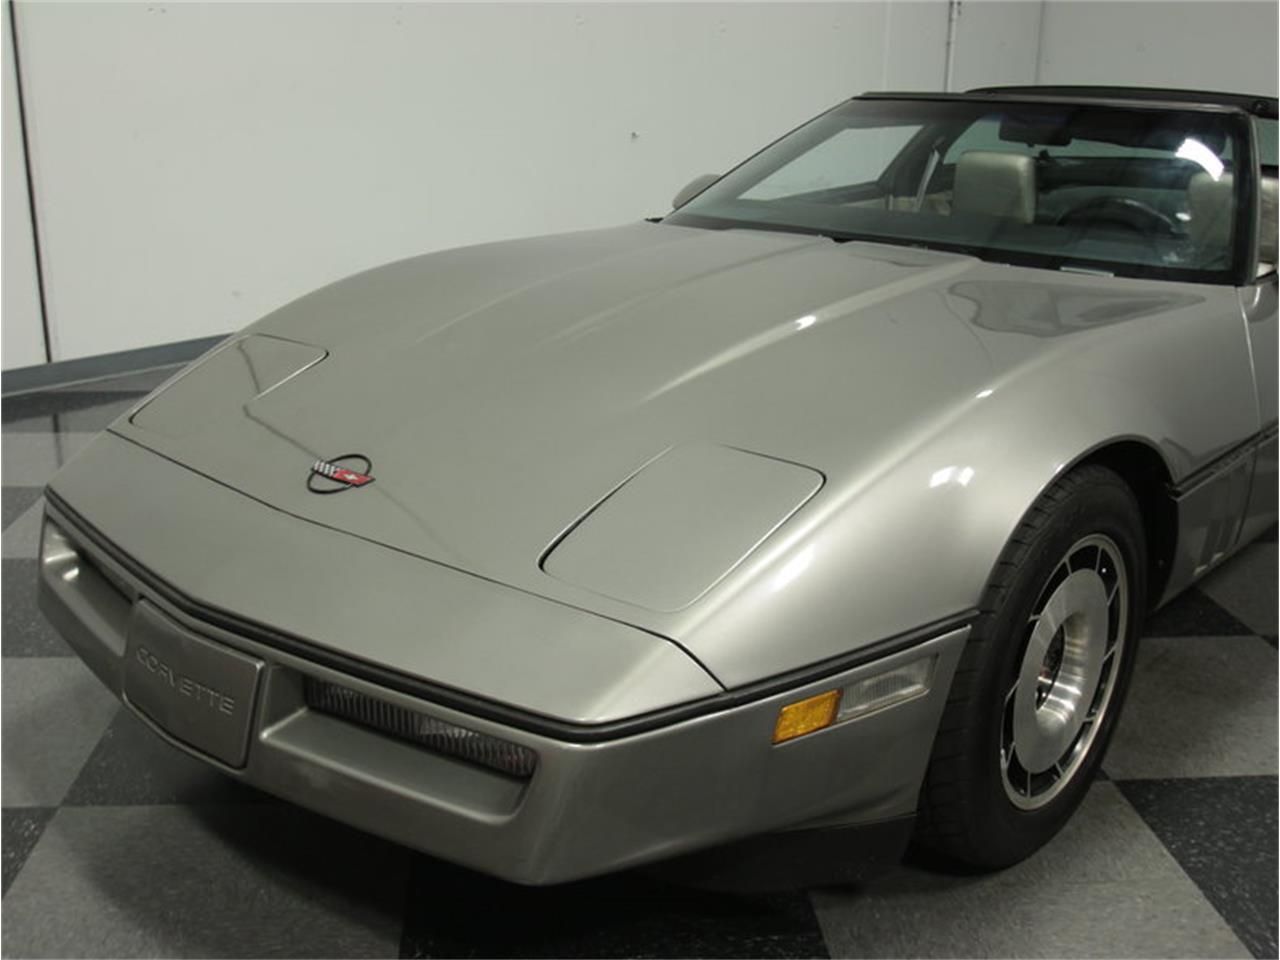 Large Picture of 1985 Chevrolet Corvette L-98 located in Georgia - $10,995.00 - J07A